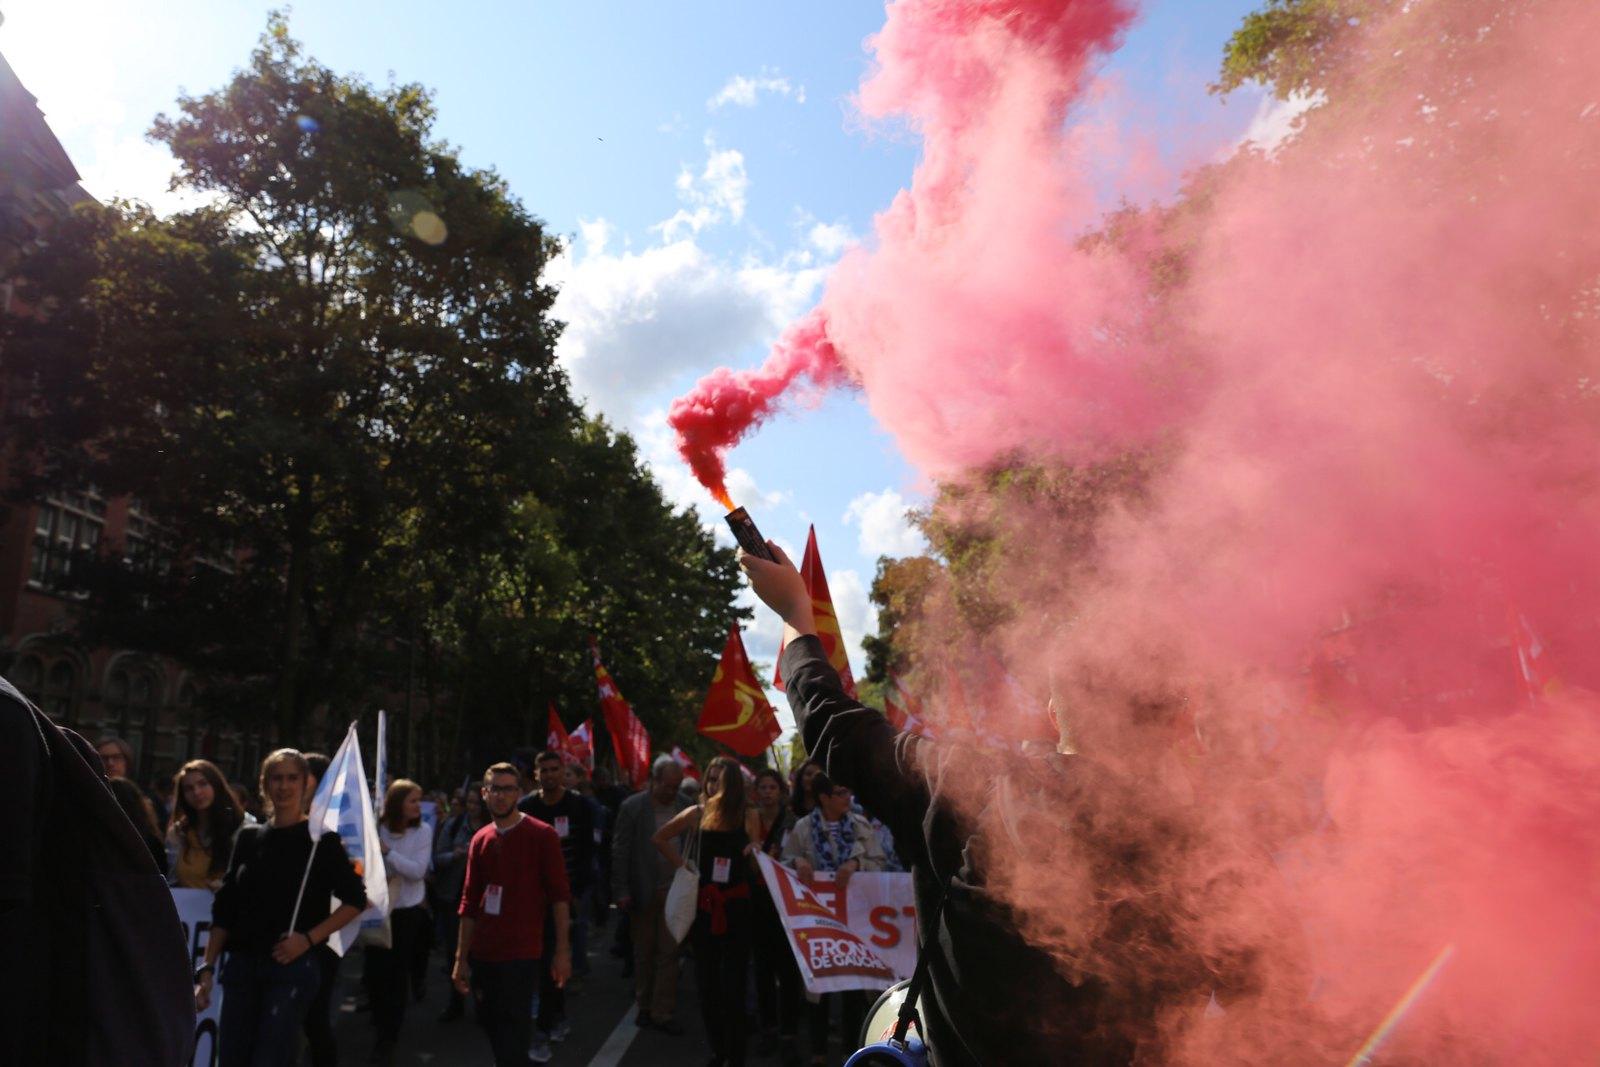 Manifestation anti loi travail Lille 12 septembre 2017